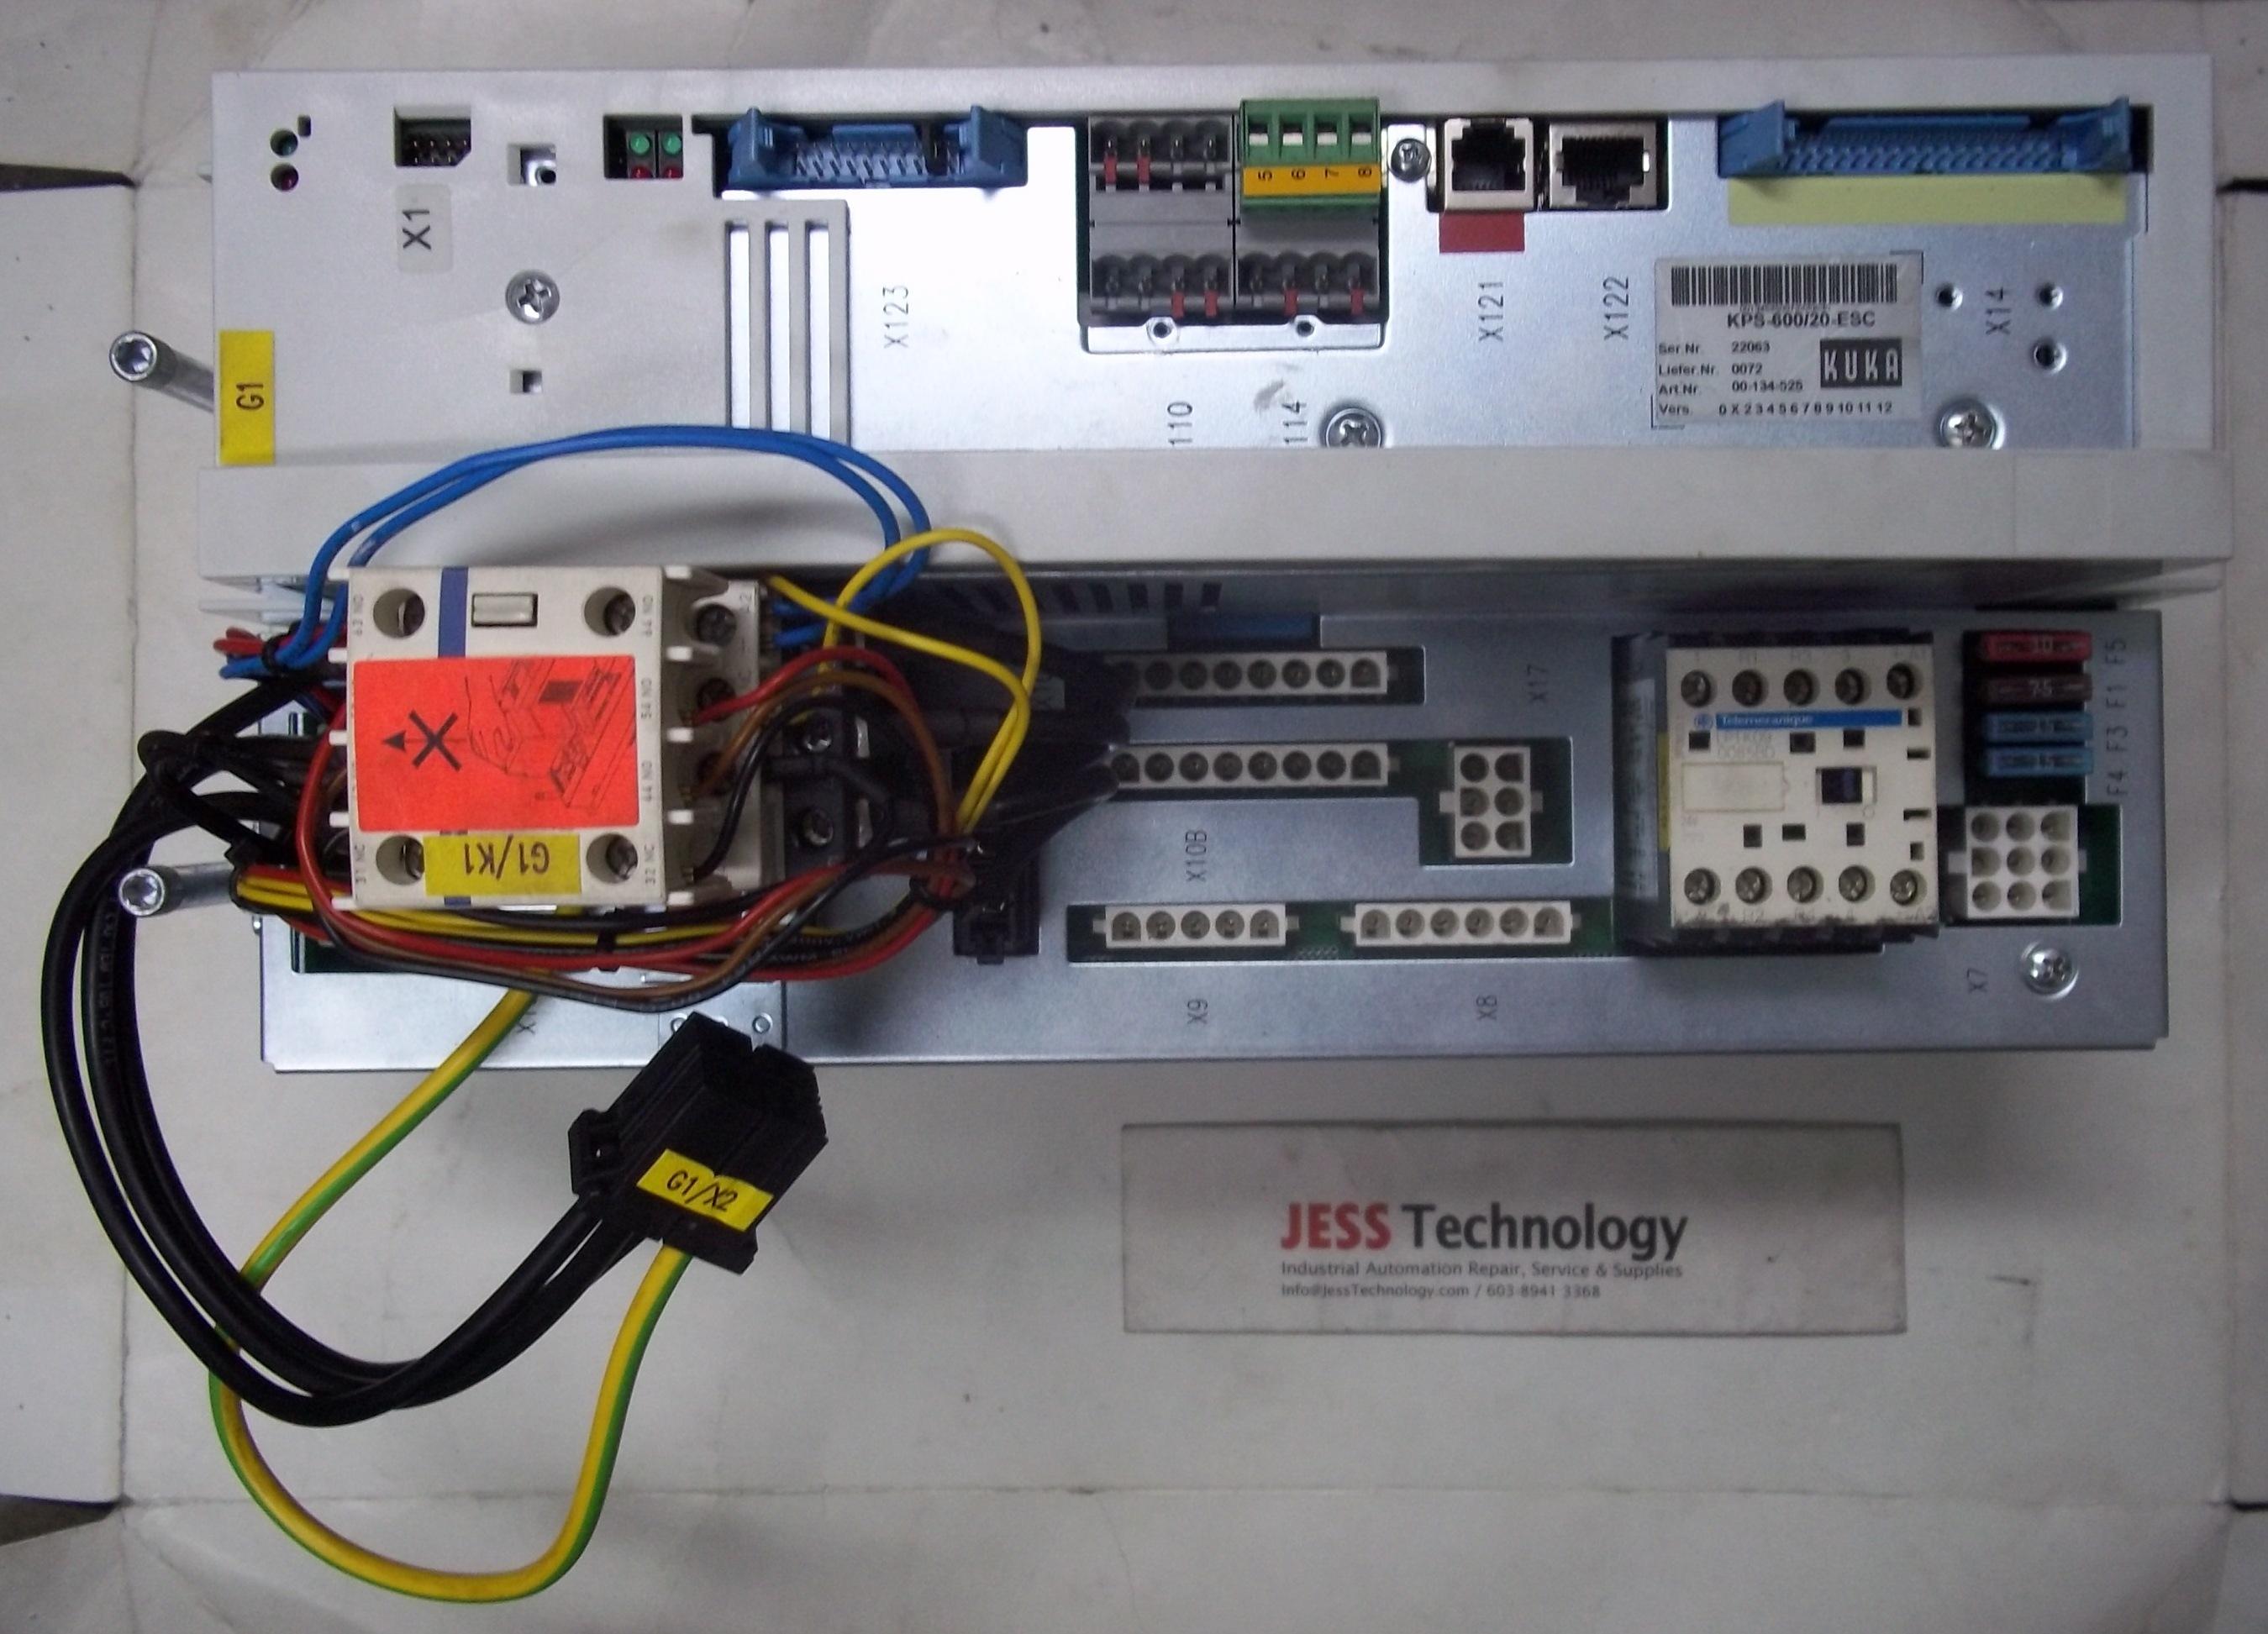 jess repair kuka power supply kps 600 20 esc in malaysia rh jesstechnology com Mixture of Electrical Supplies Residential Electrical Supplies Wholesale